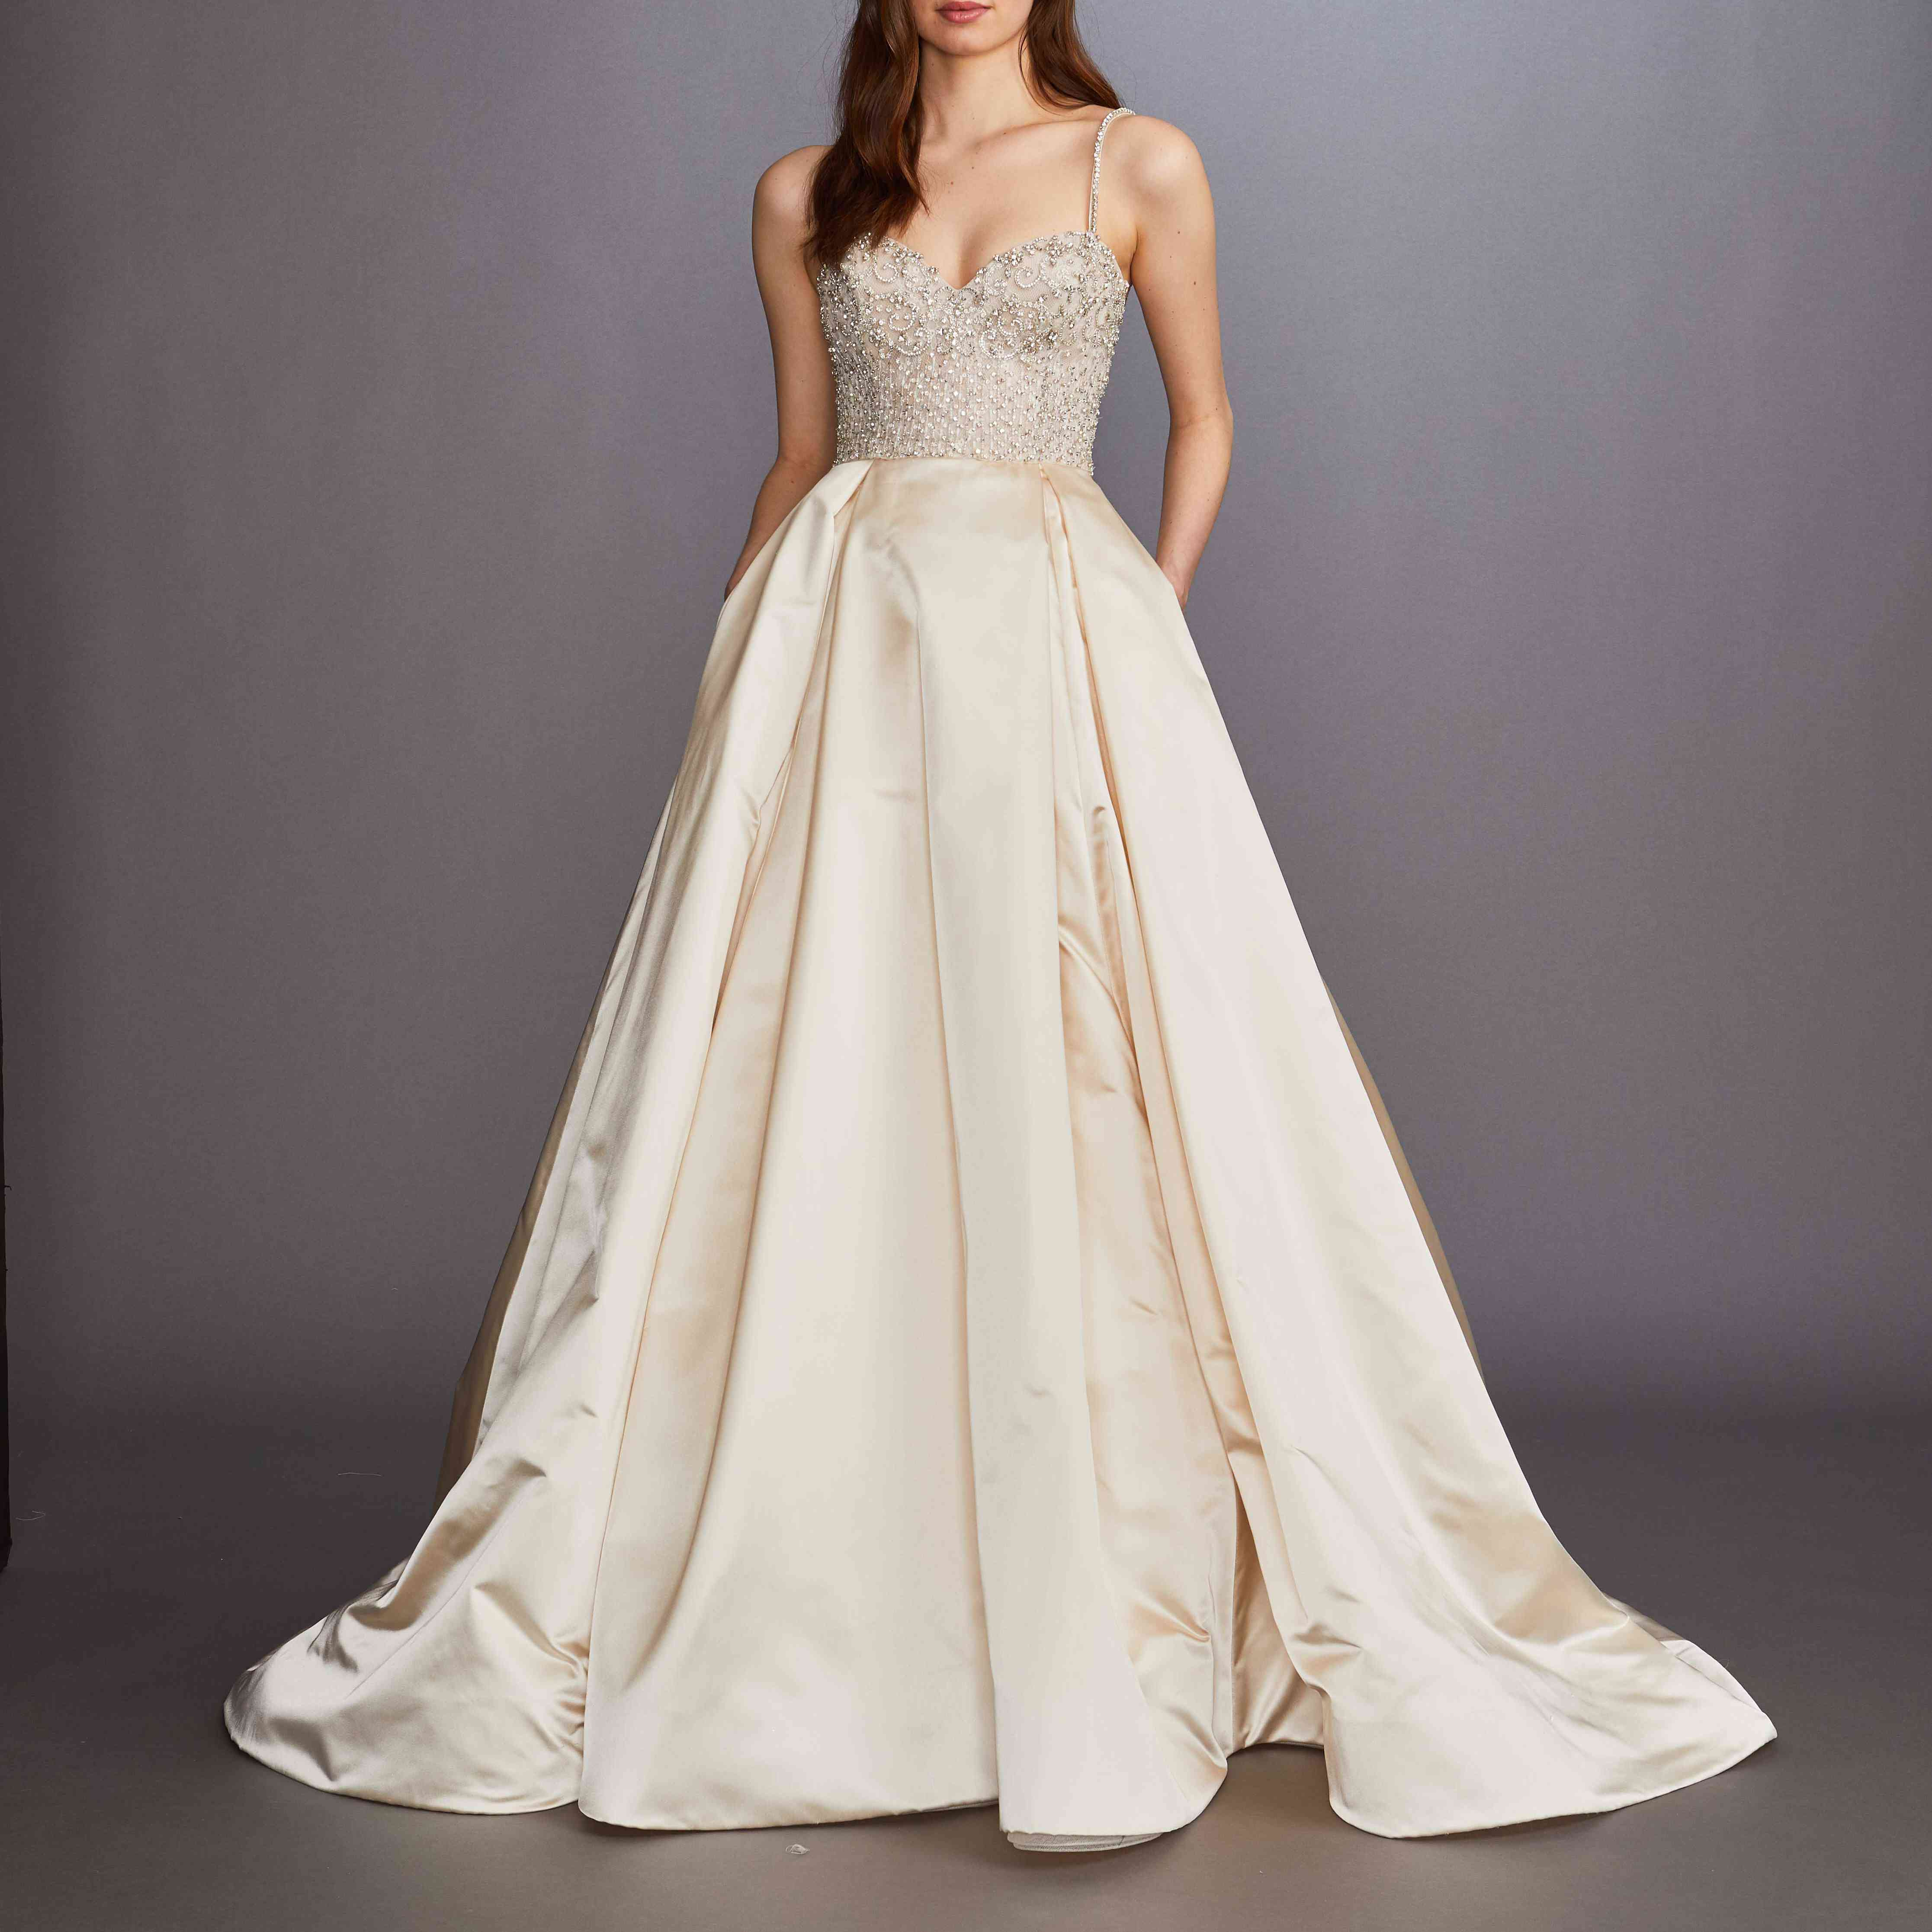 Olena blush wedding ball gown by Lazaro